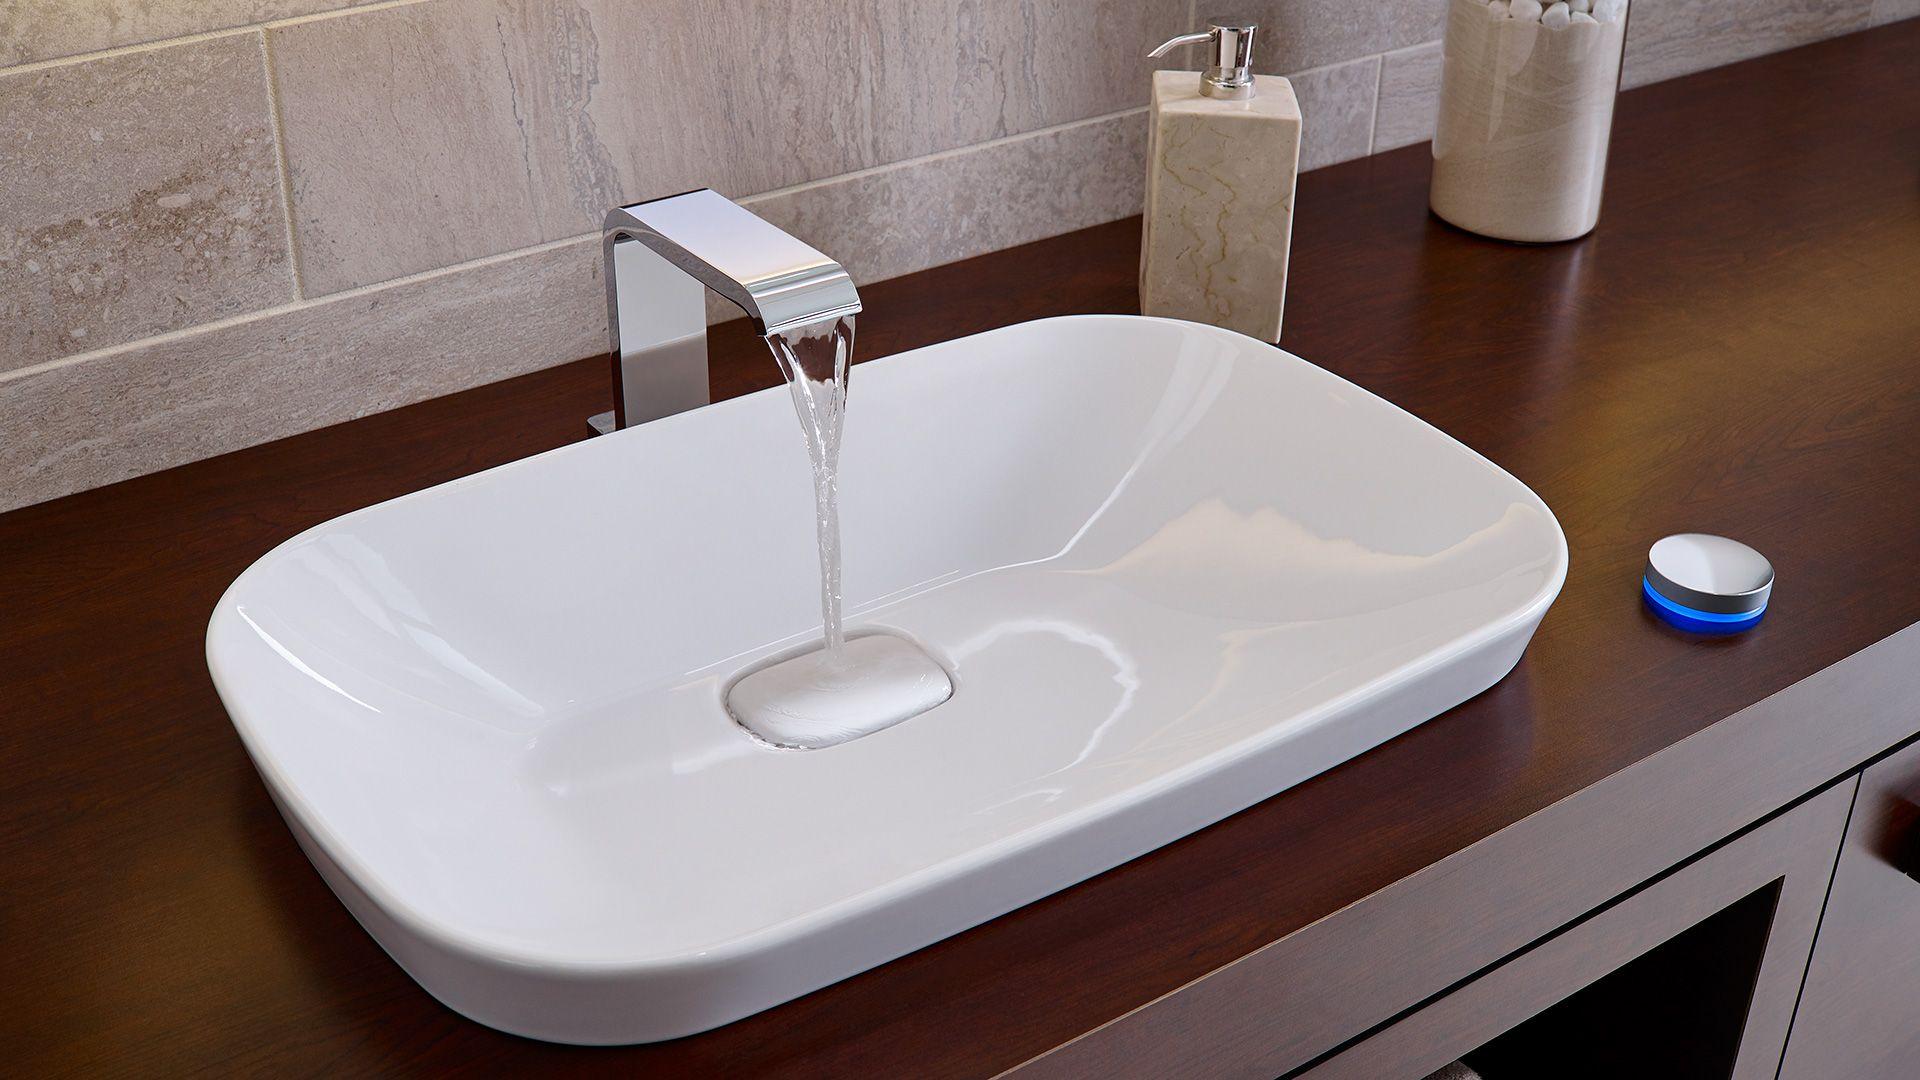 Neorest® Kiwami® Semi-Recessed Vessel Lavatory - TotoUSA.com